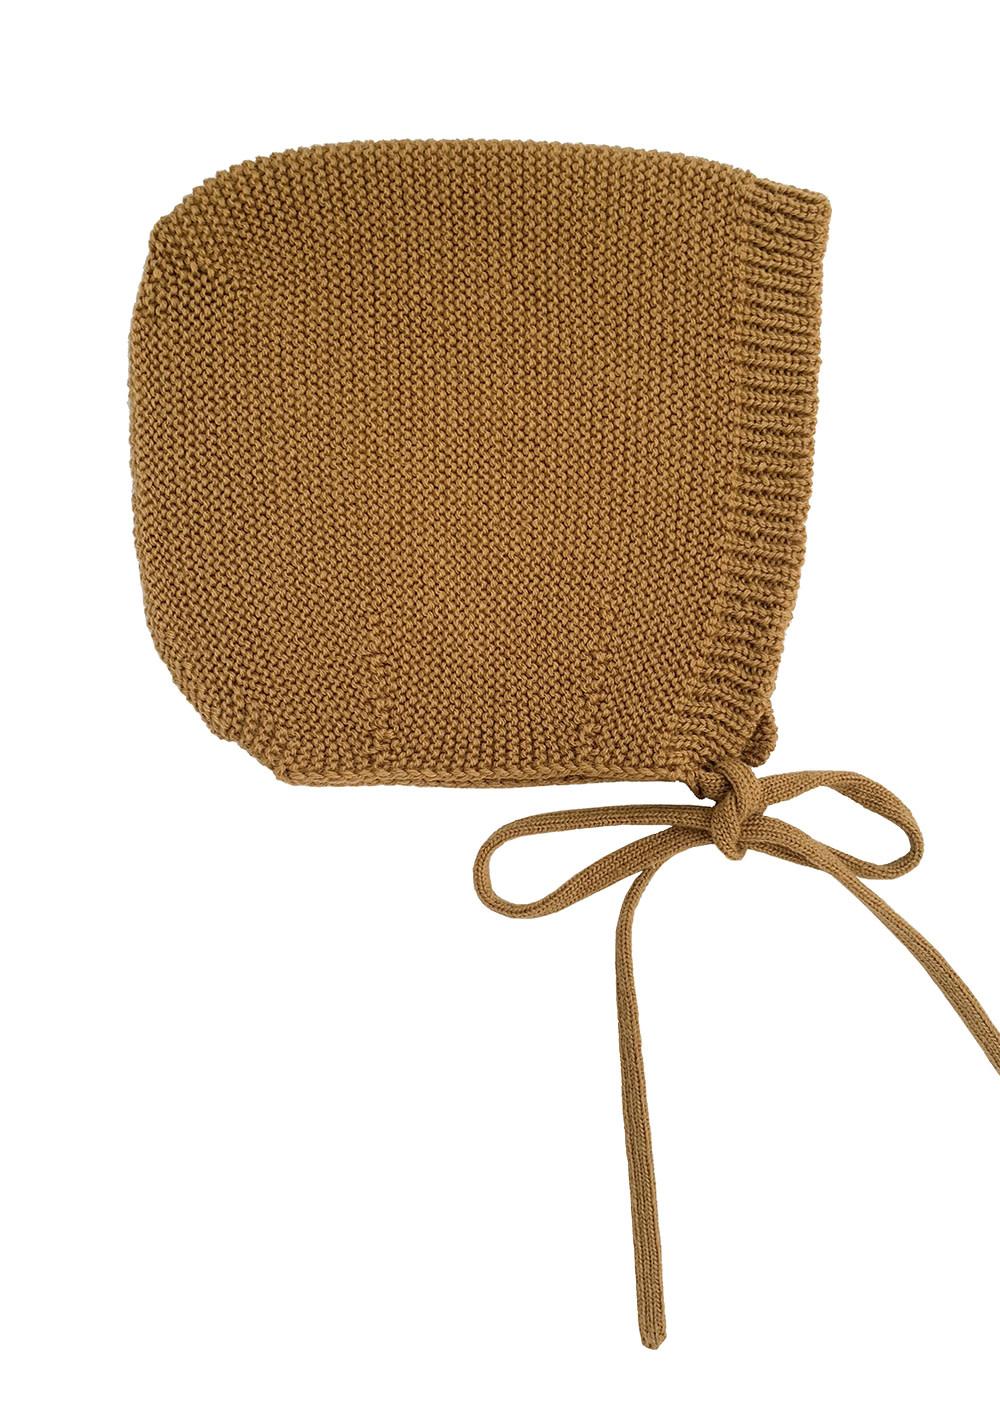 Bonnet dolly mustard-4